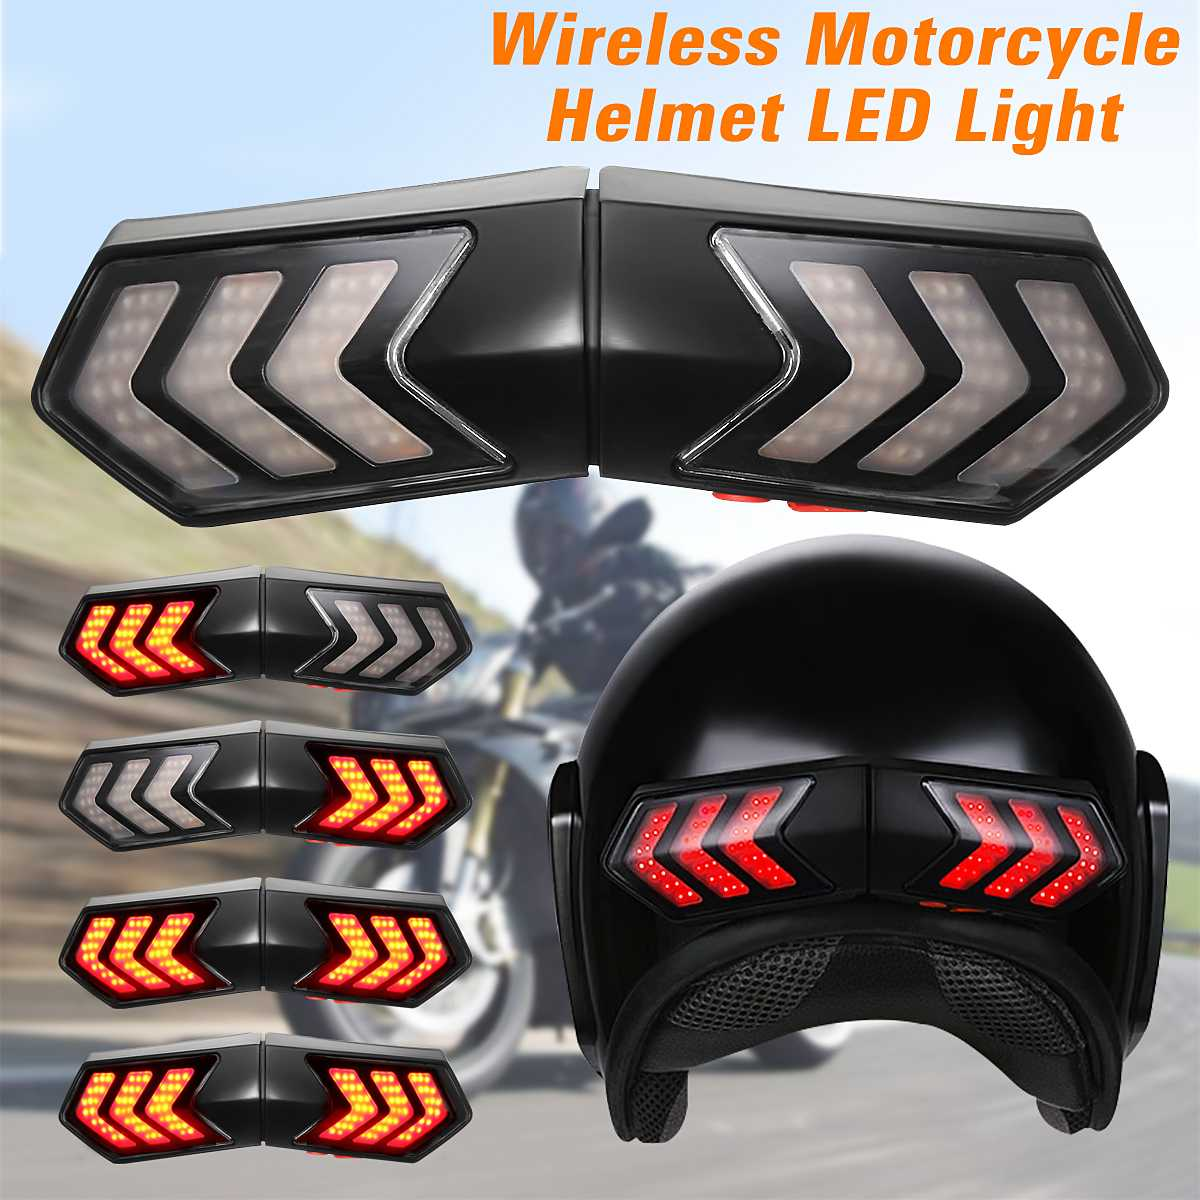 12V Wireless Motorcycle Helmet LED Safety Light Brake Lights Turn Signal Indicators